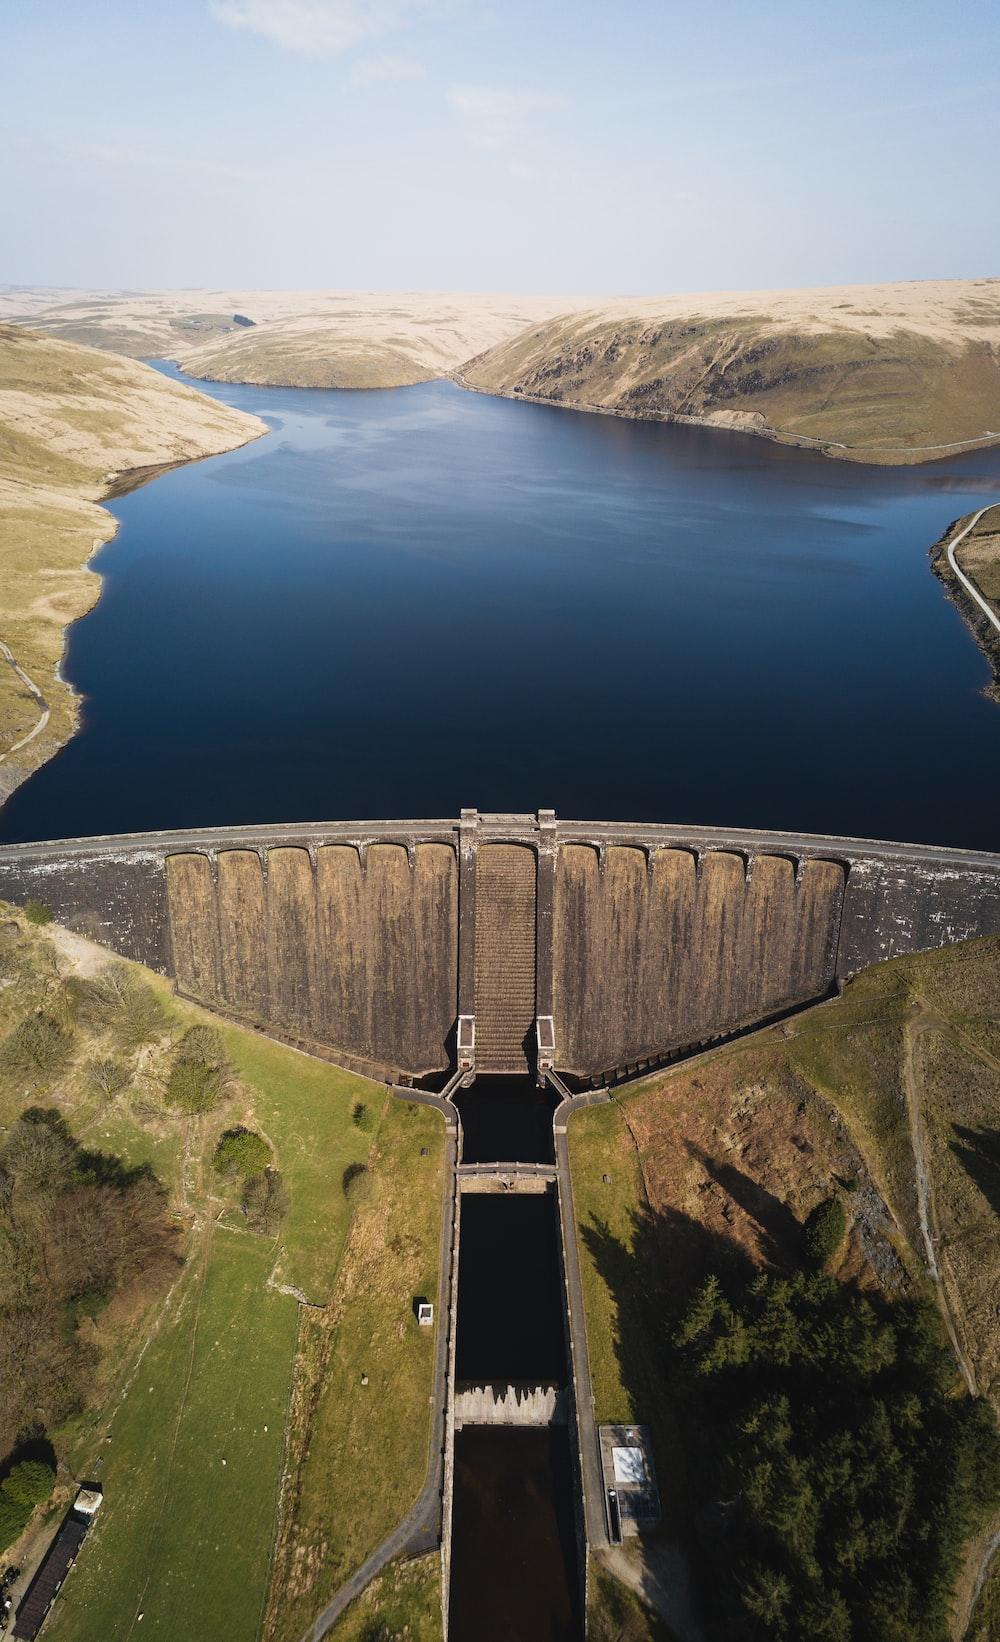 aerial photo of dam during daytime